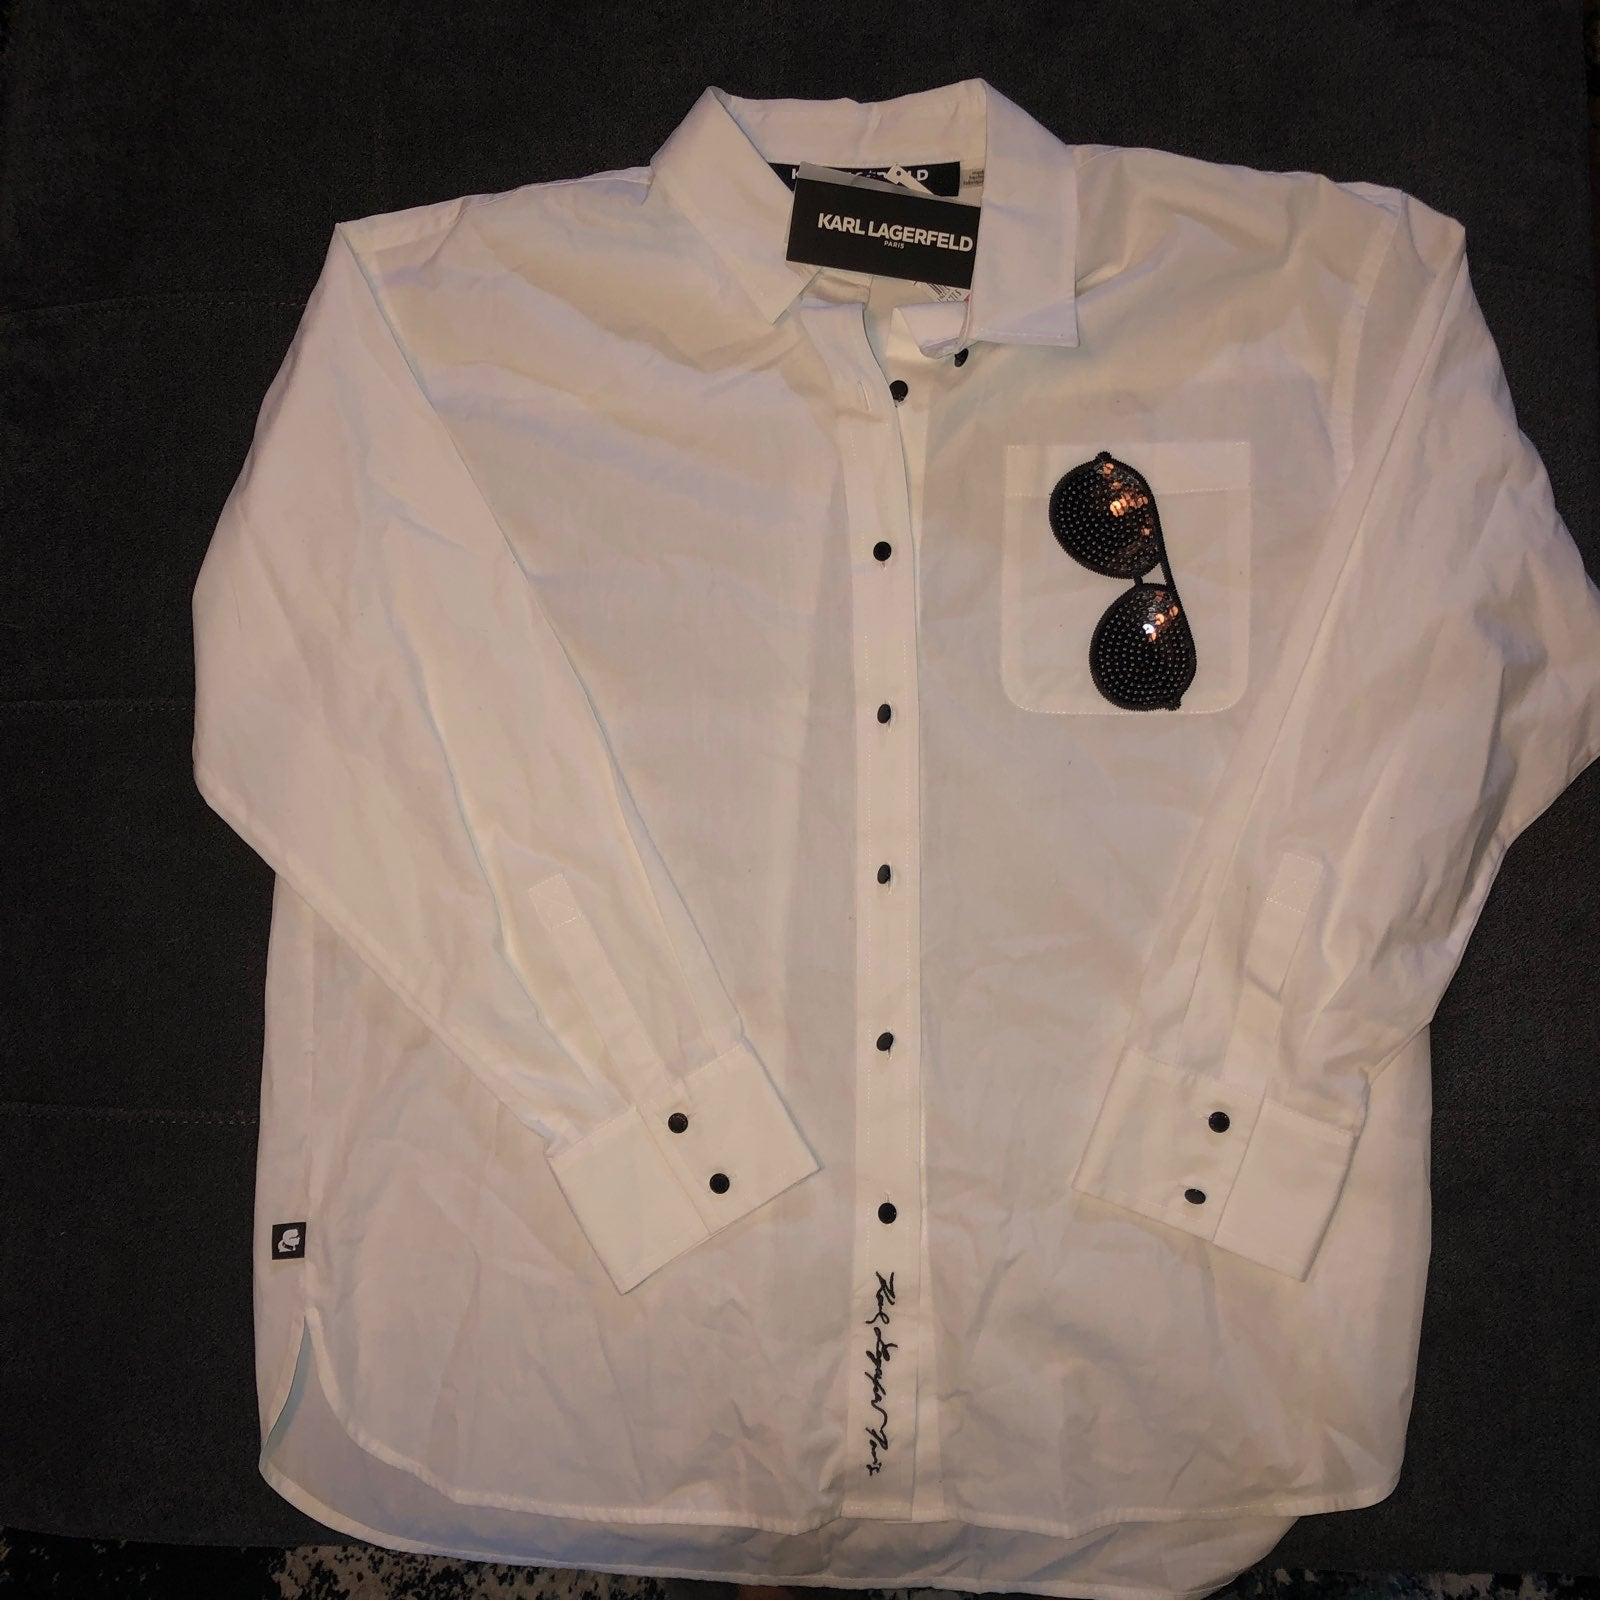 Karl Lagerfeld White Button Shirt